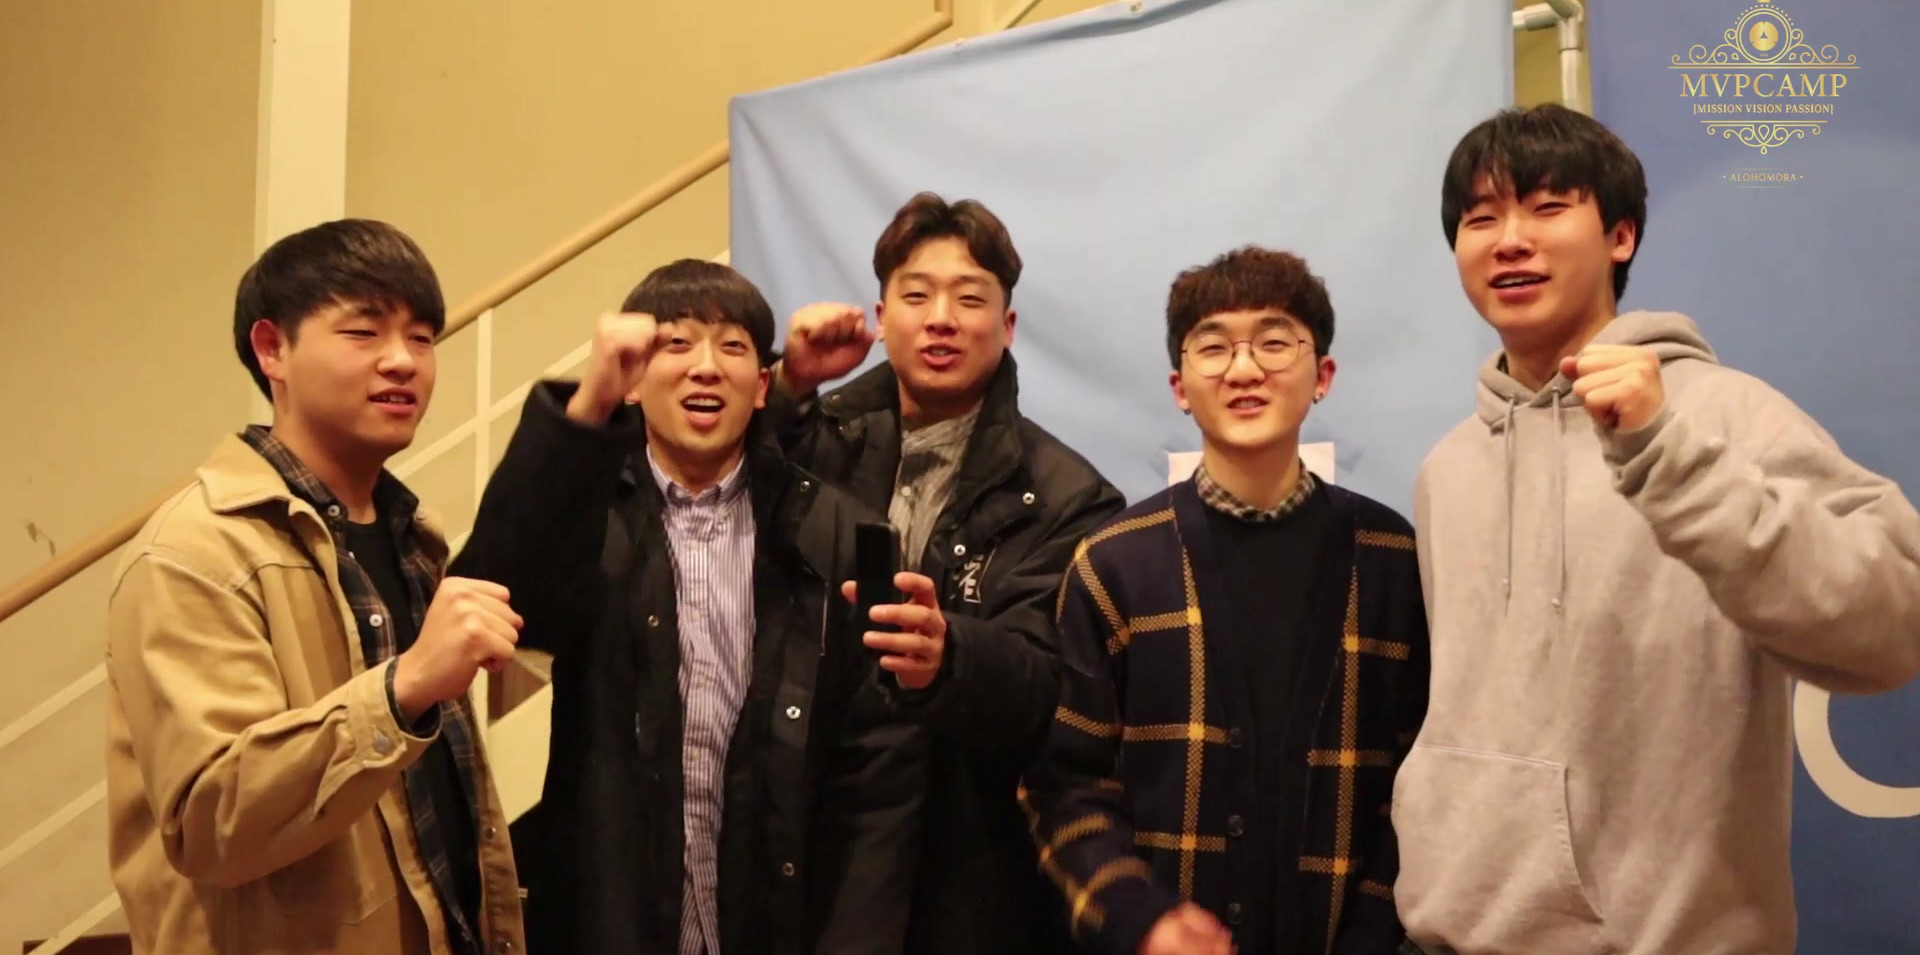 2019MVP캠프 하이라이트 영상_Trim.mp4